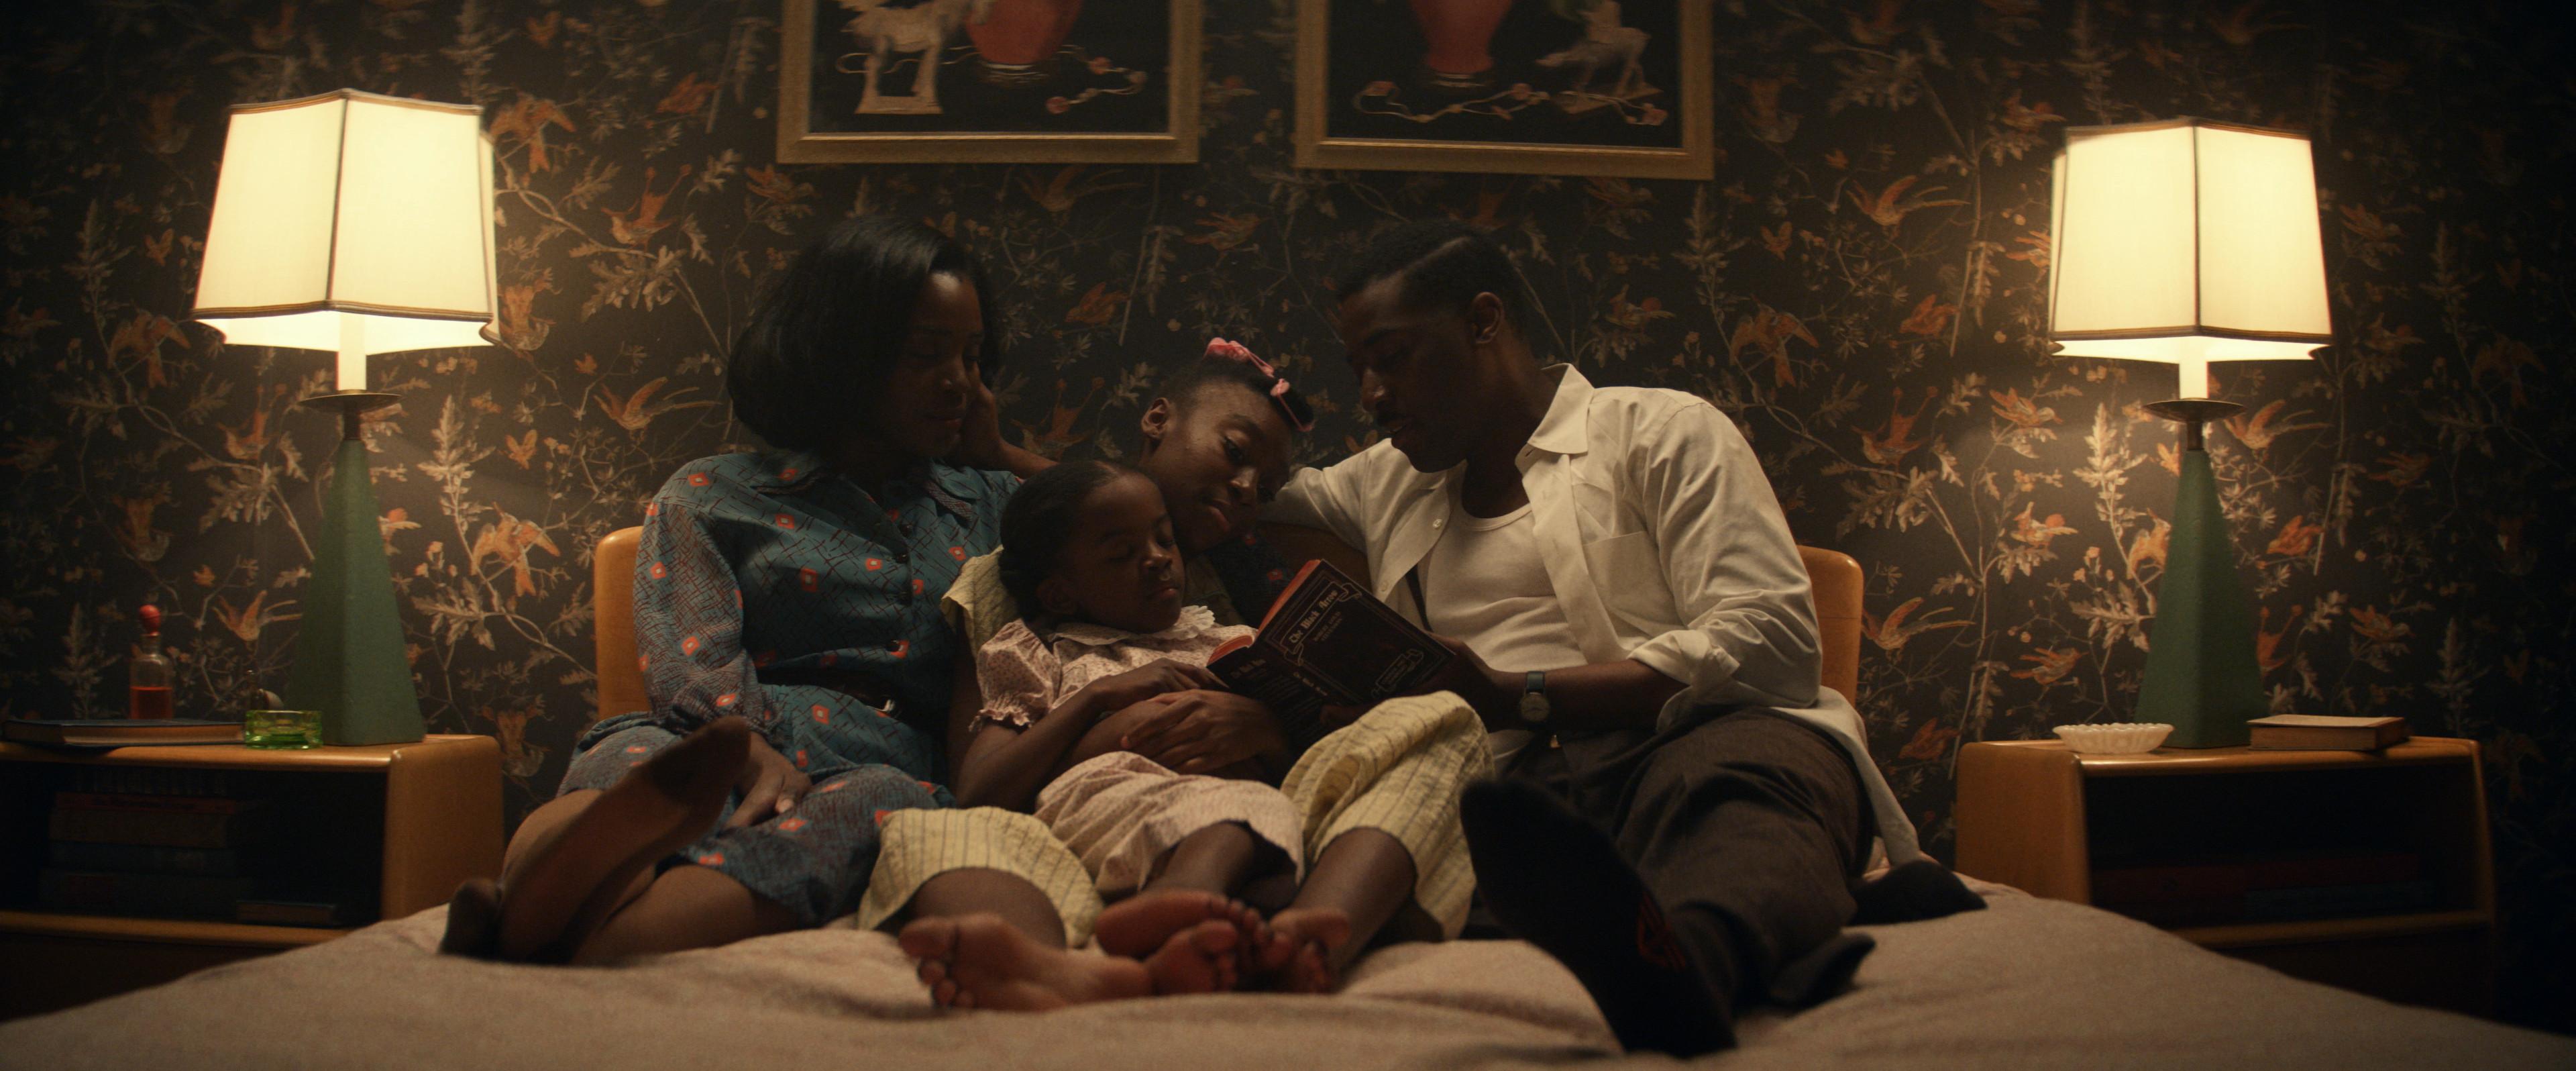 'THEM': (l-r) Deborah Ayorinde as Livia 'Lucky' Emory, Melody Hurd as Gracie Jean Emory, Shahadi Wright Joseph as Ruby Lee Emory and Ashley Thomas as Henry Emory